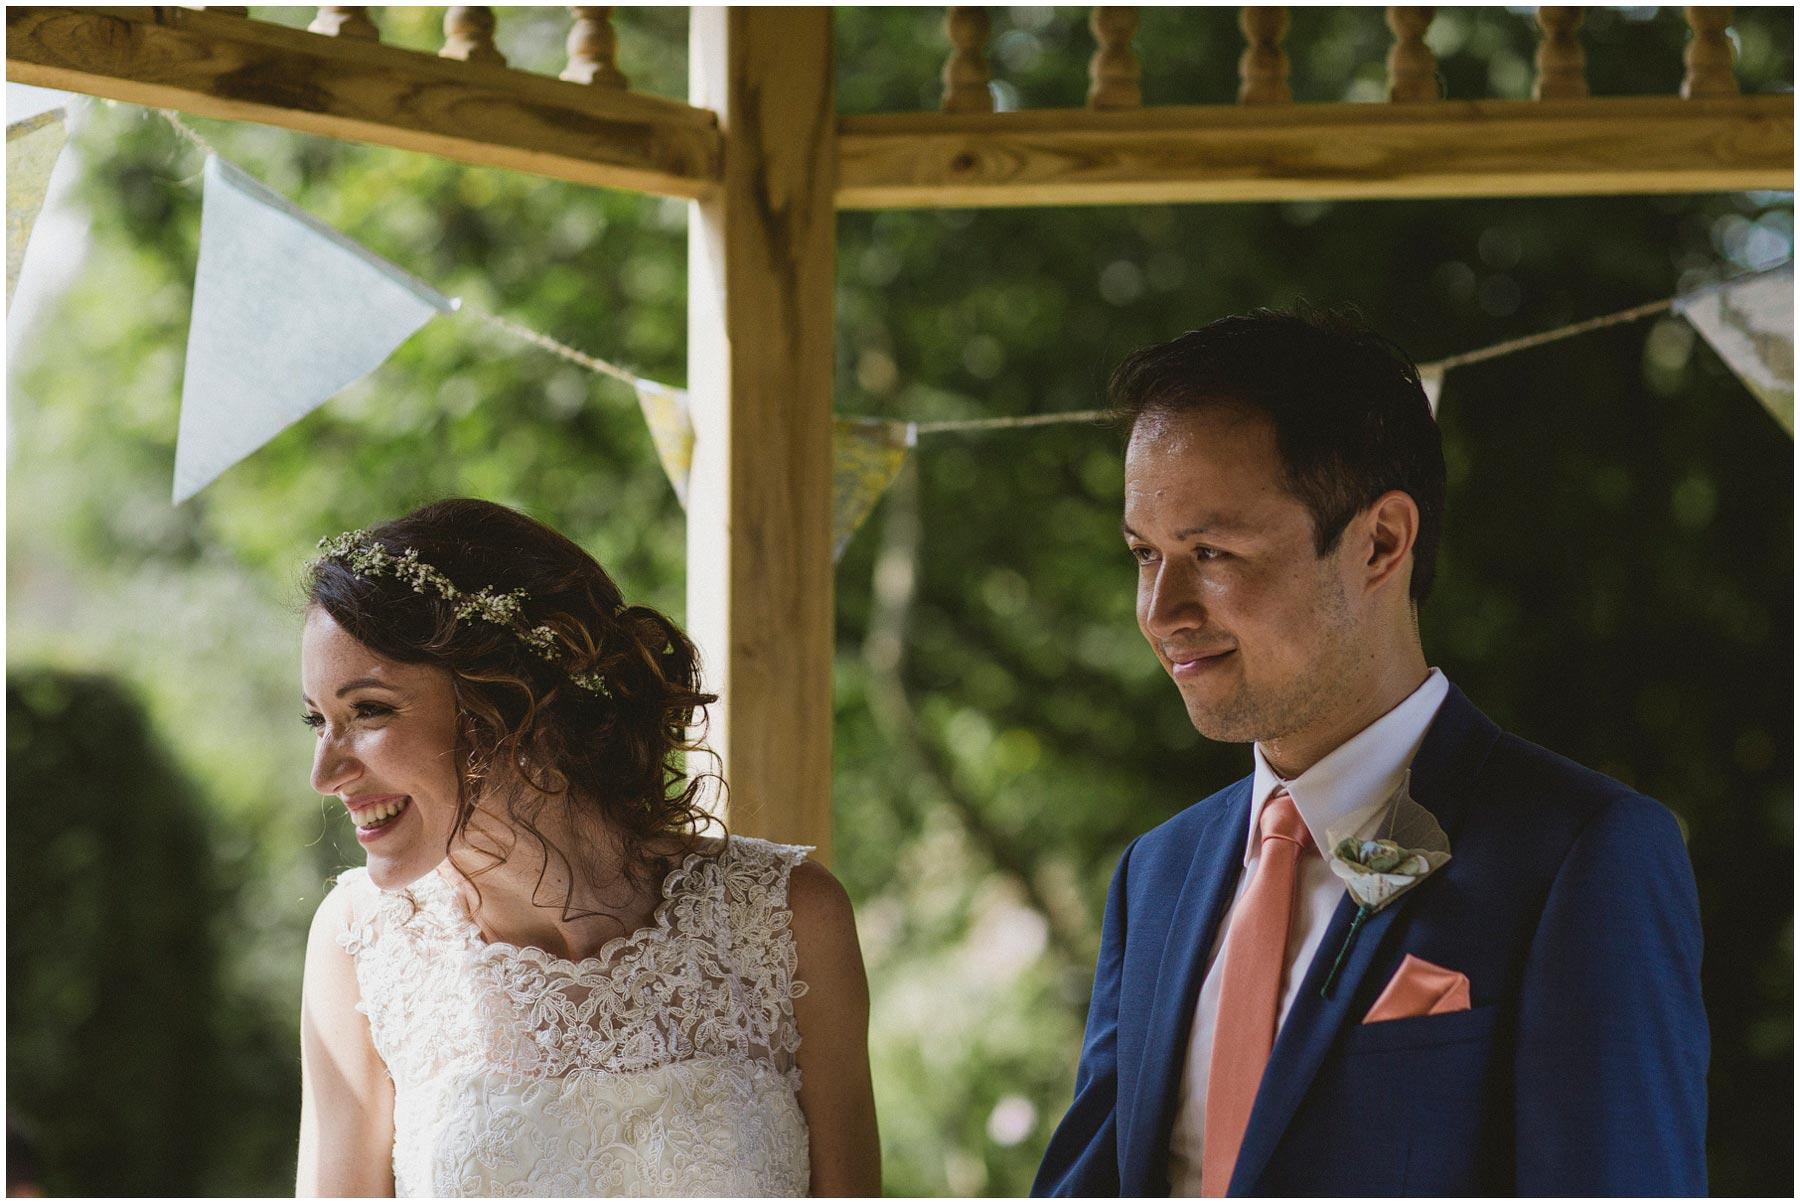 Colehayes-Park-Wedding-Photography_0076